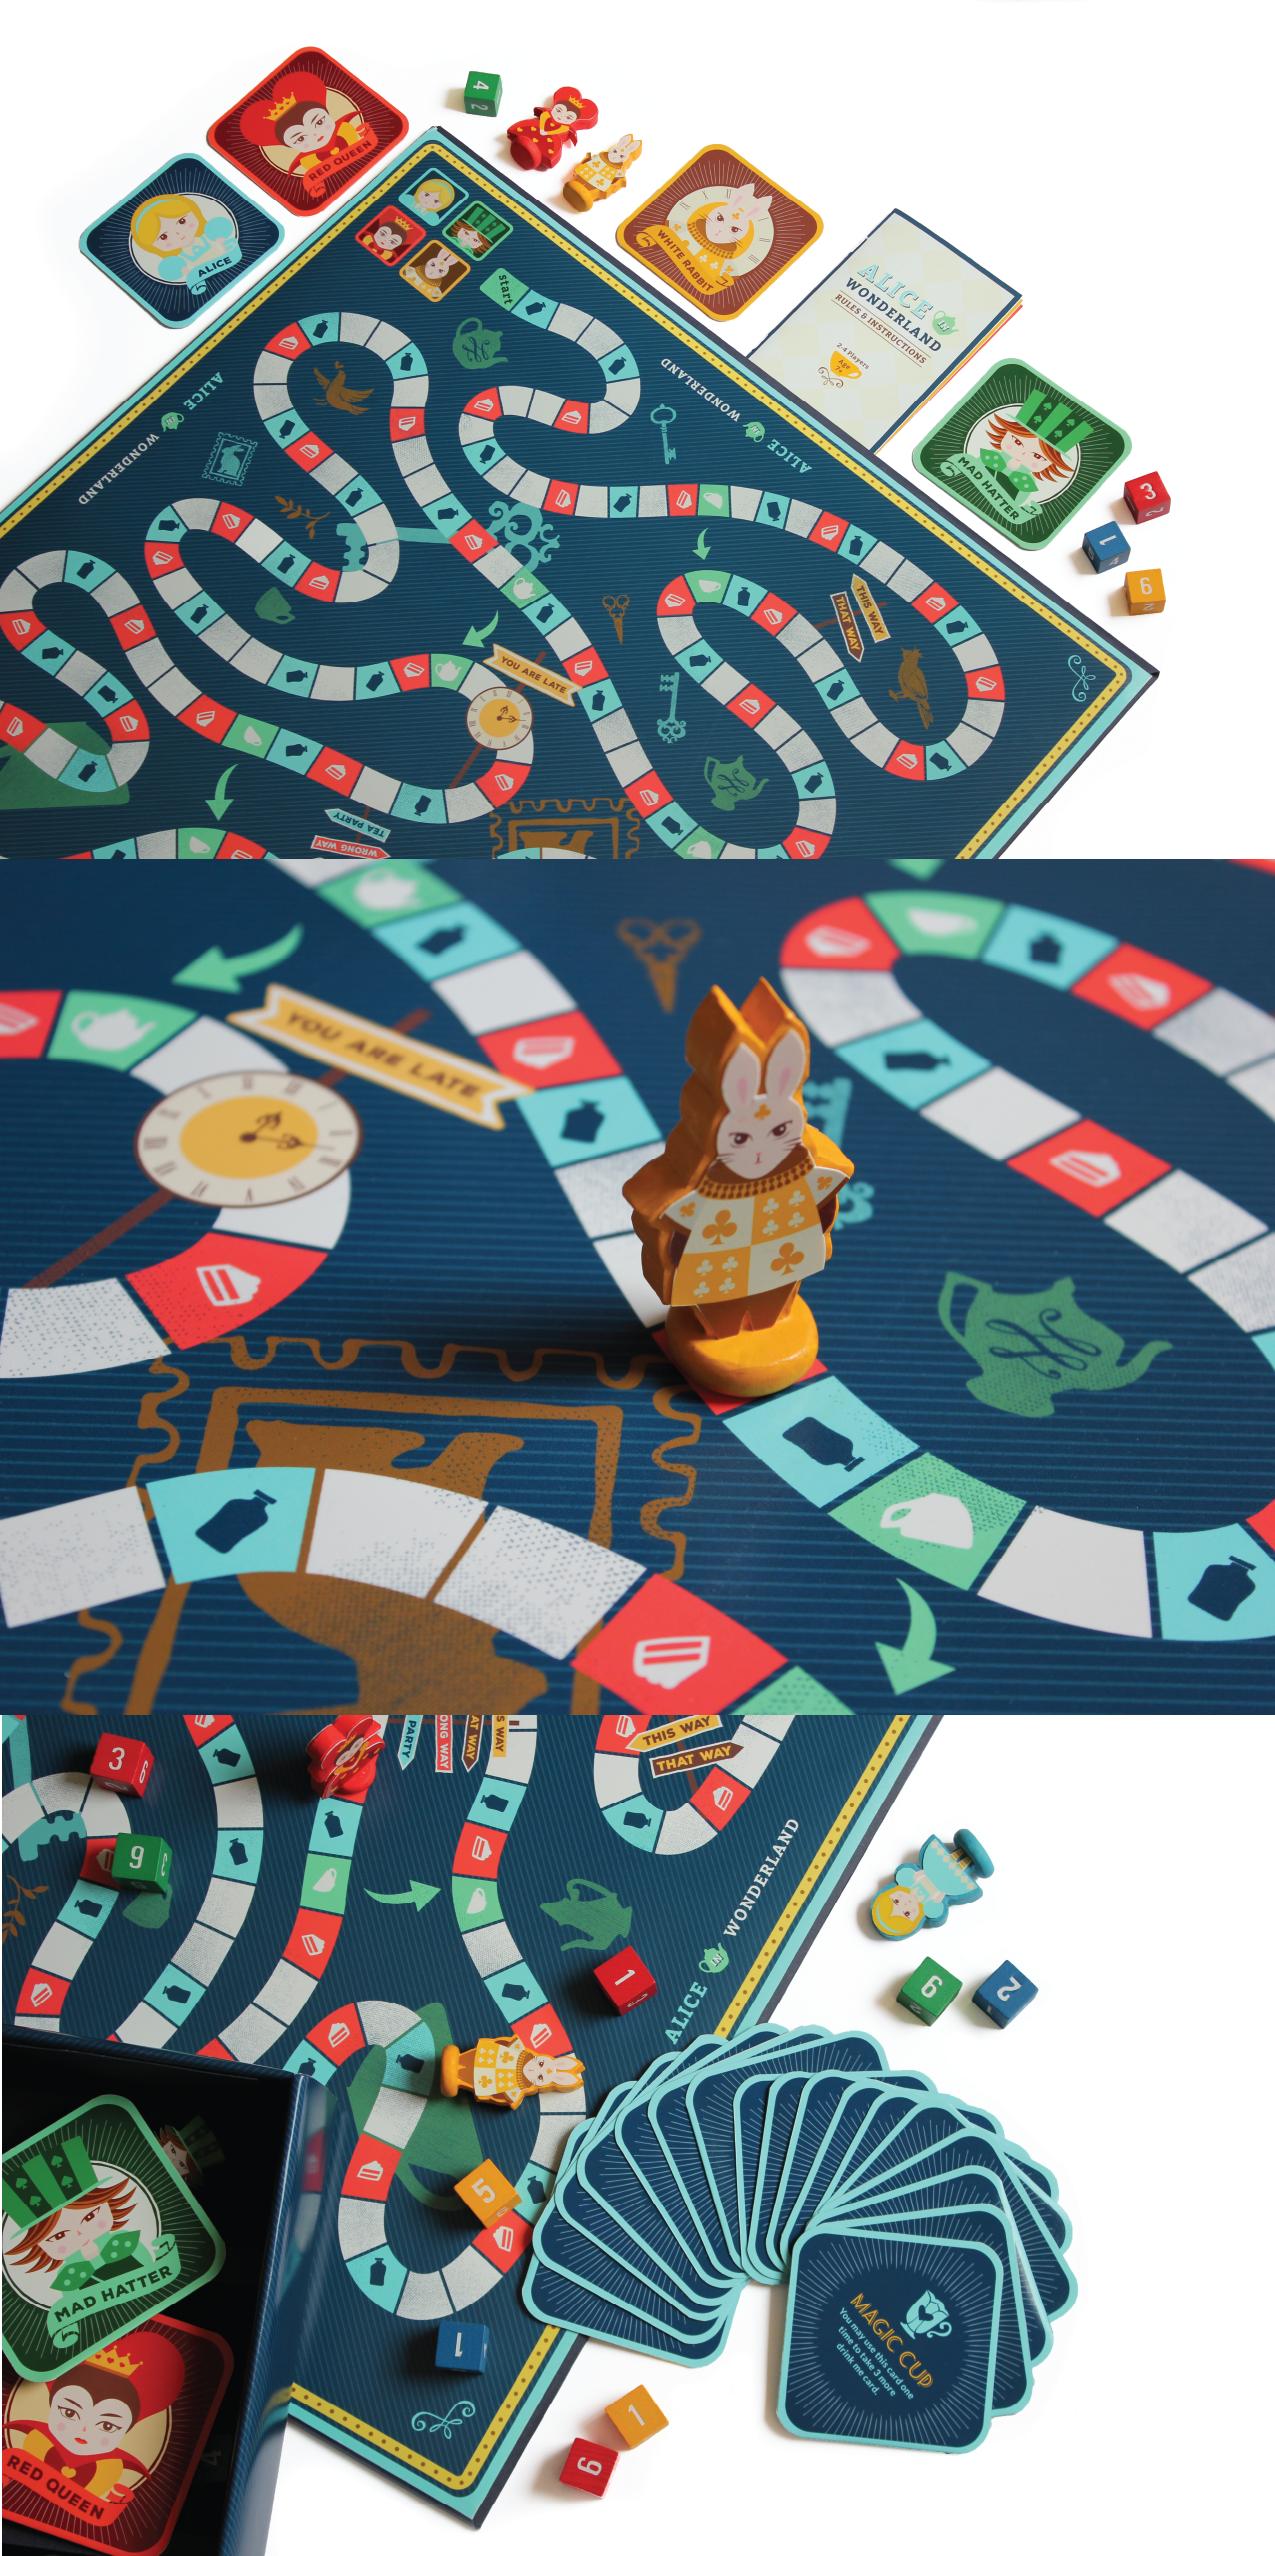 Alice in Wonderland iPhone Game Walkthrough Part 10 - YouTube